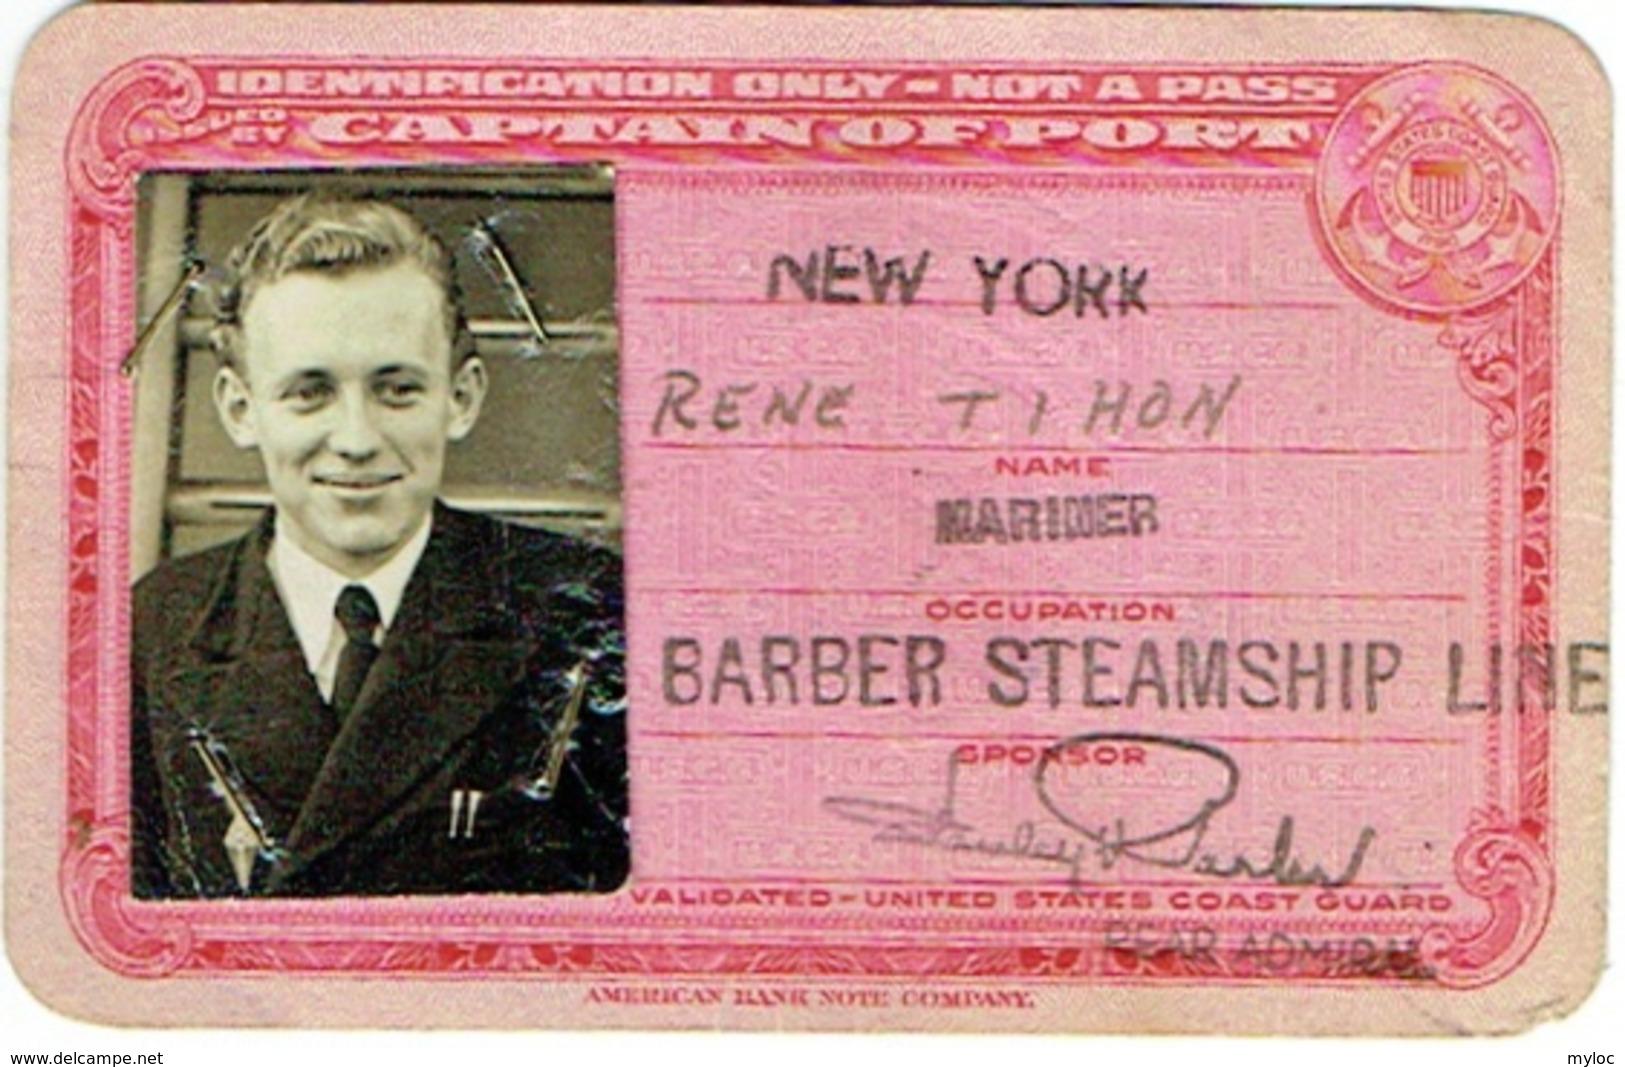 Bateau. Identification Card With Foto. Barber Steamship Line. New York. 1943. - Bateaux